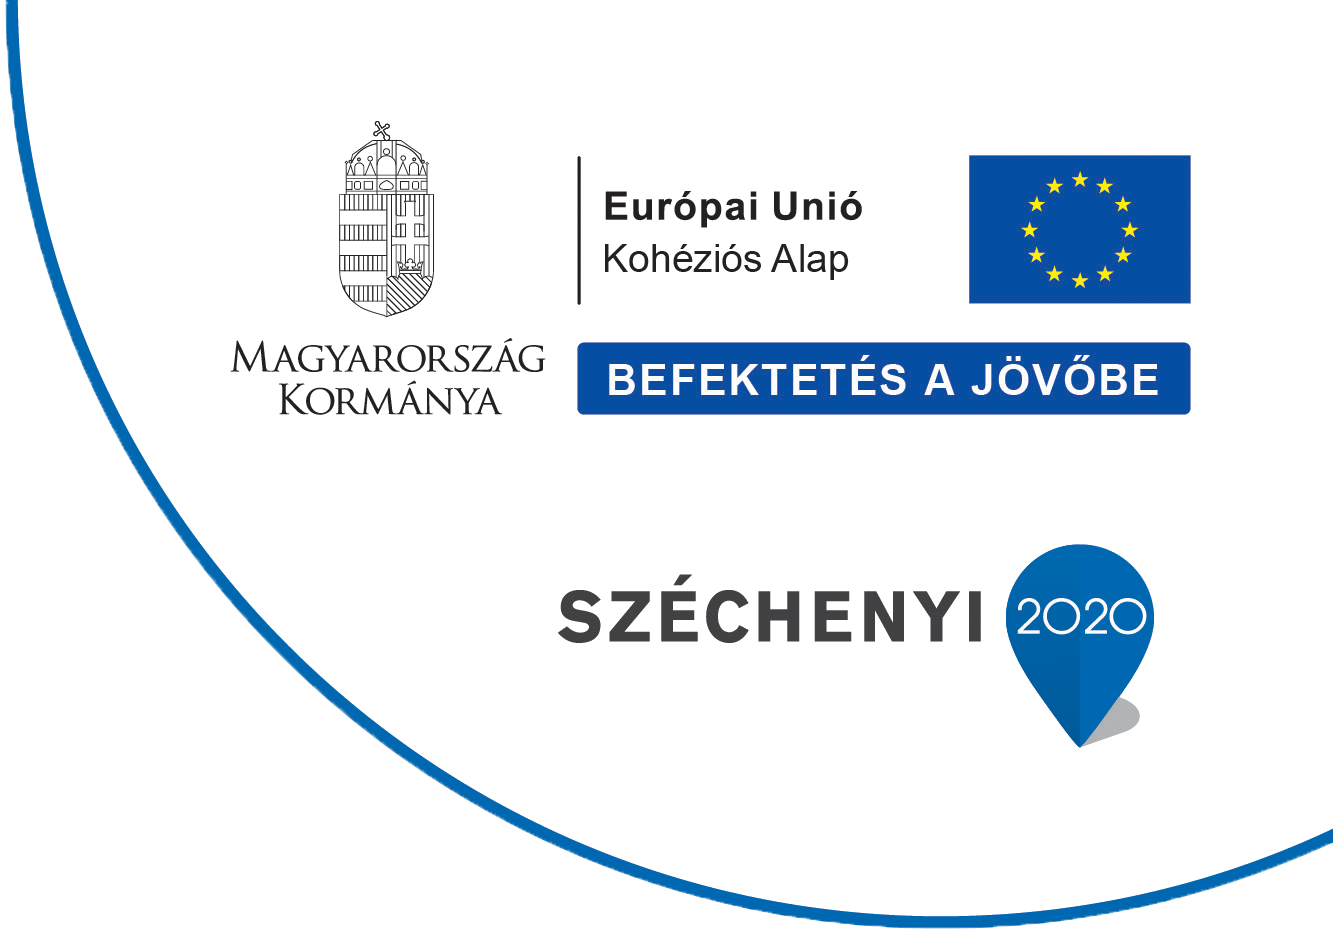 Széchenyi 2020 Kohéziós